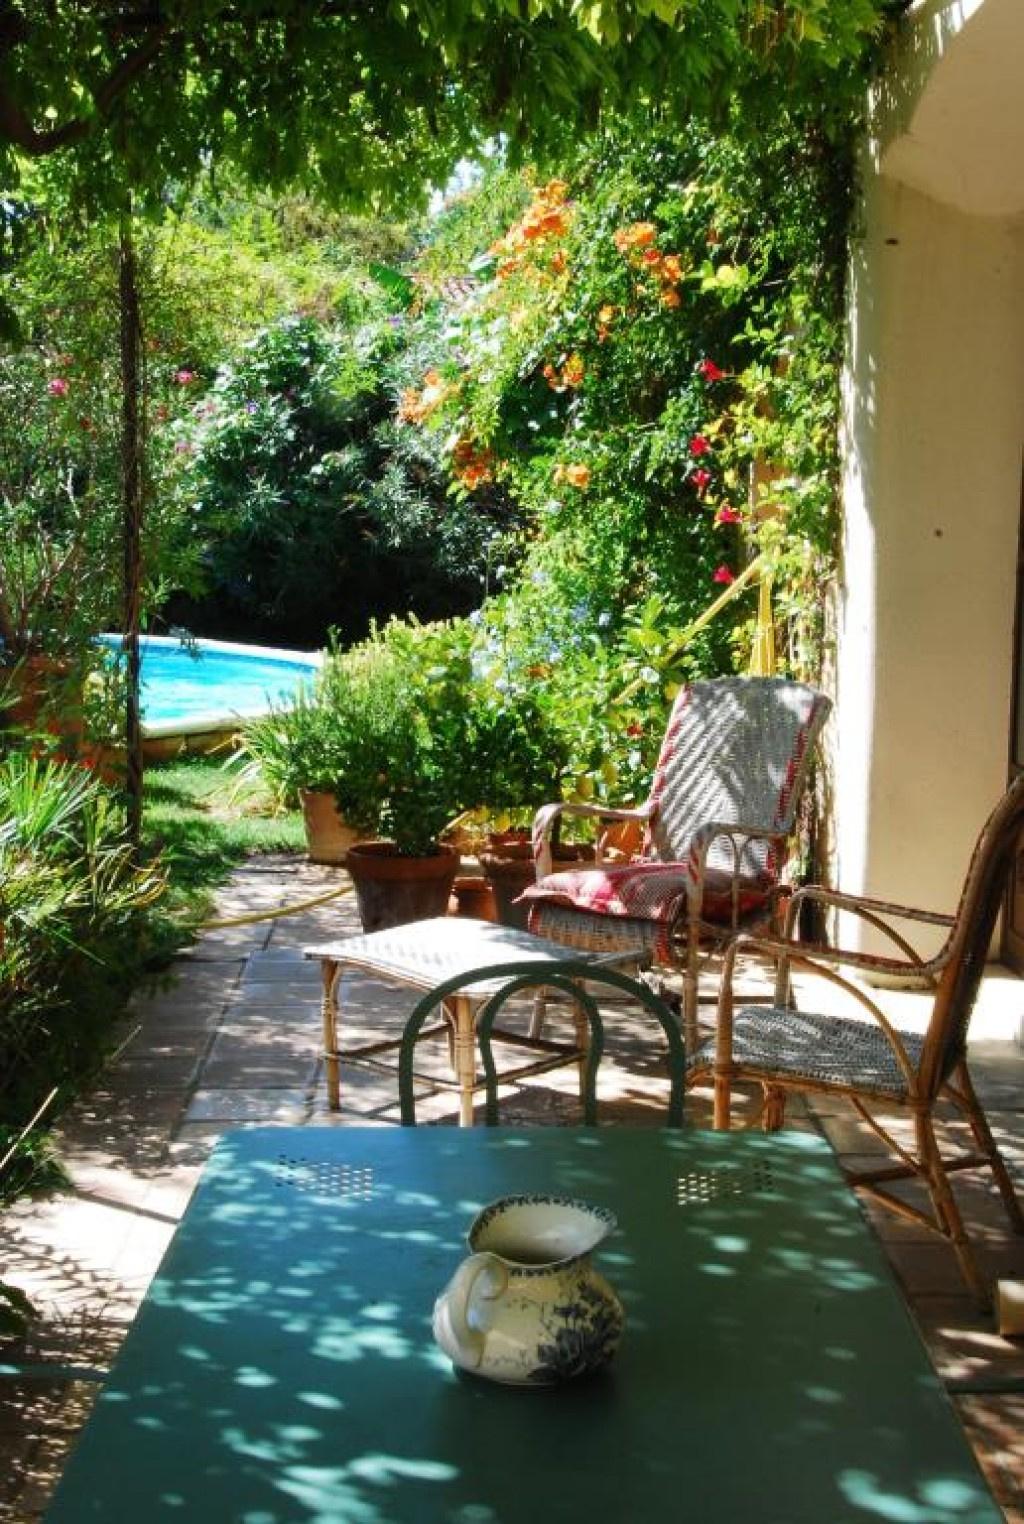 maison bourgroise jardin village Gard agence Corinne Ponce Nimes (49)